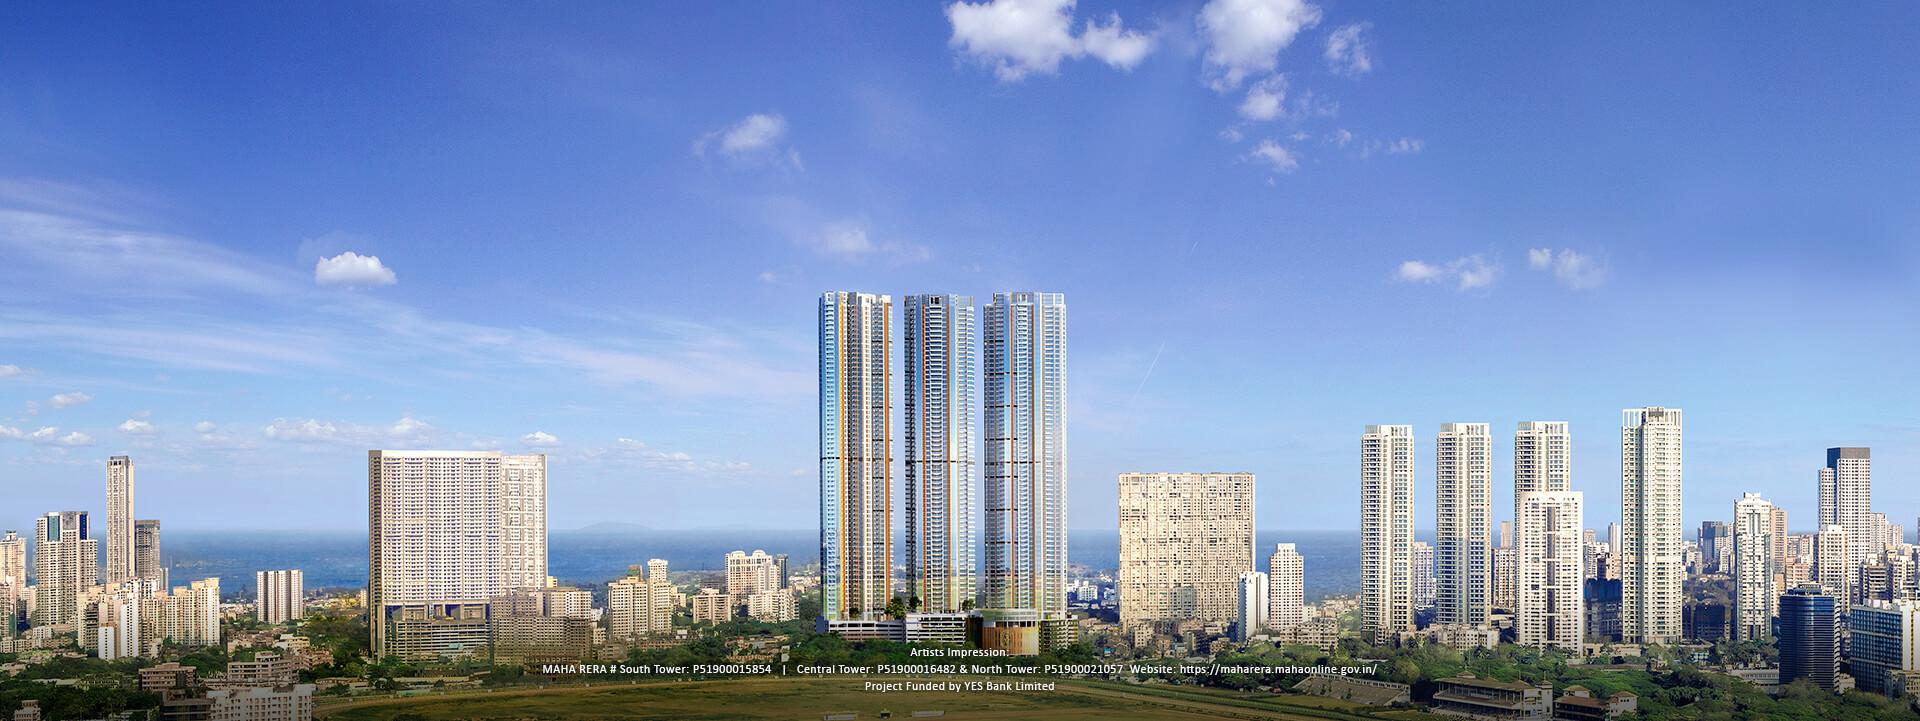 piramal mahalaxmi north tower